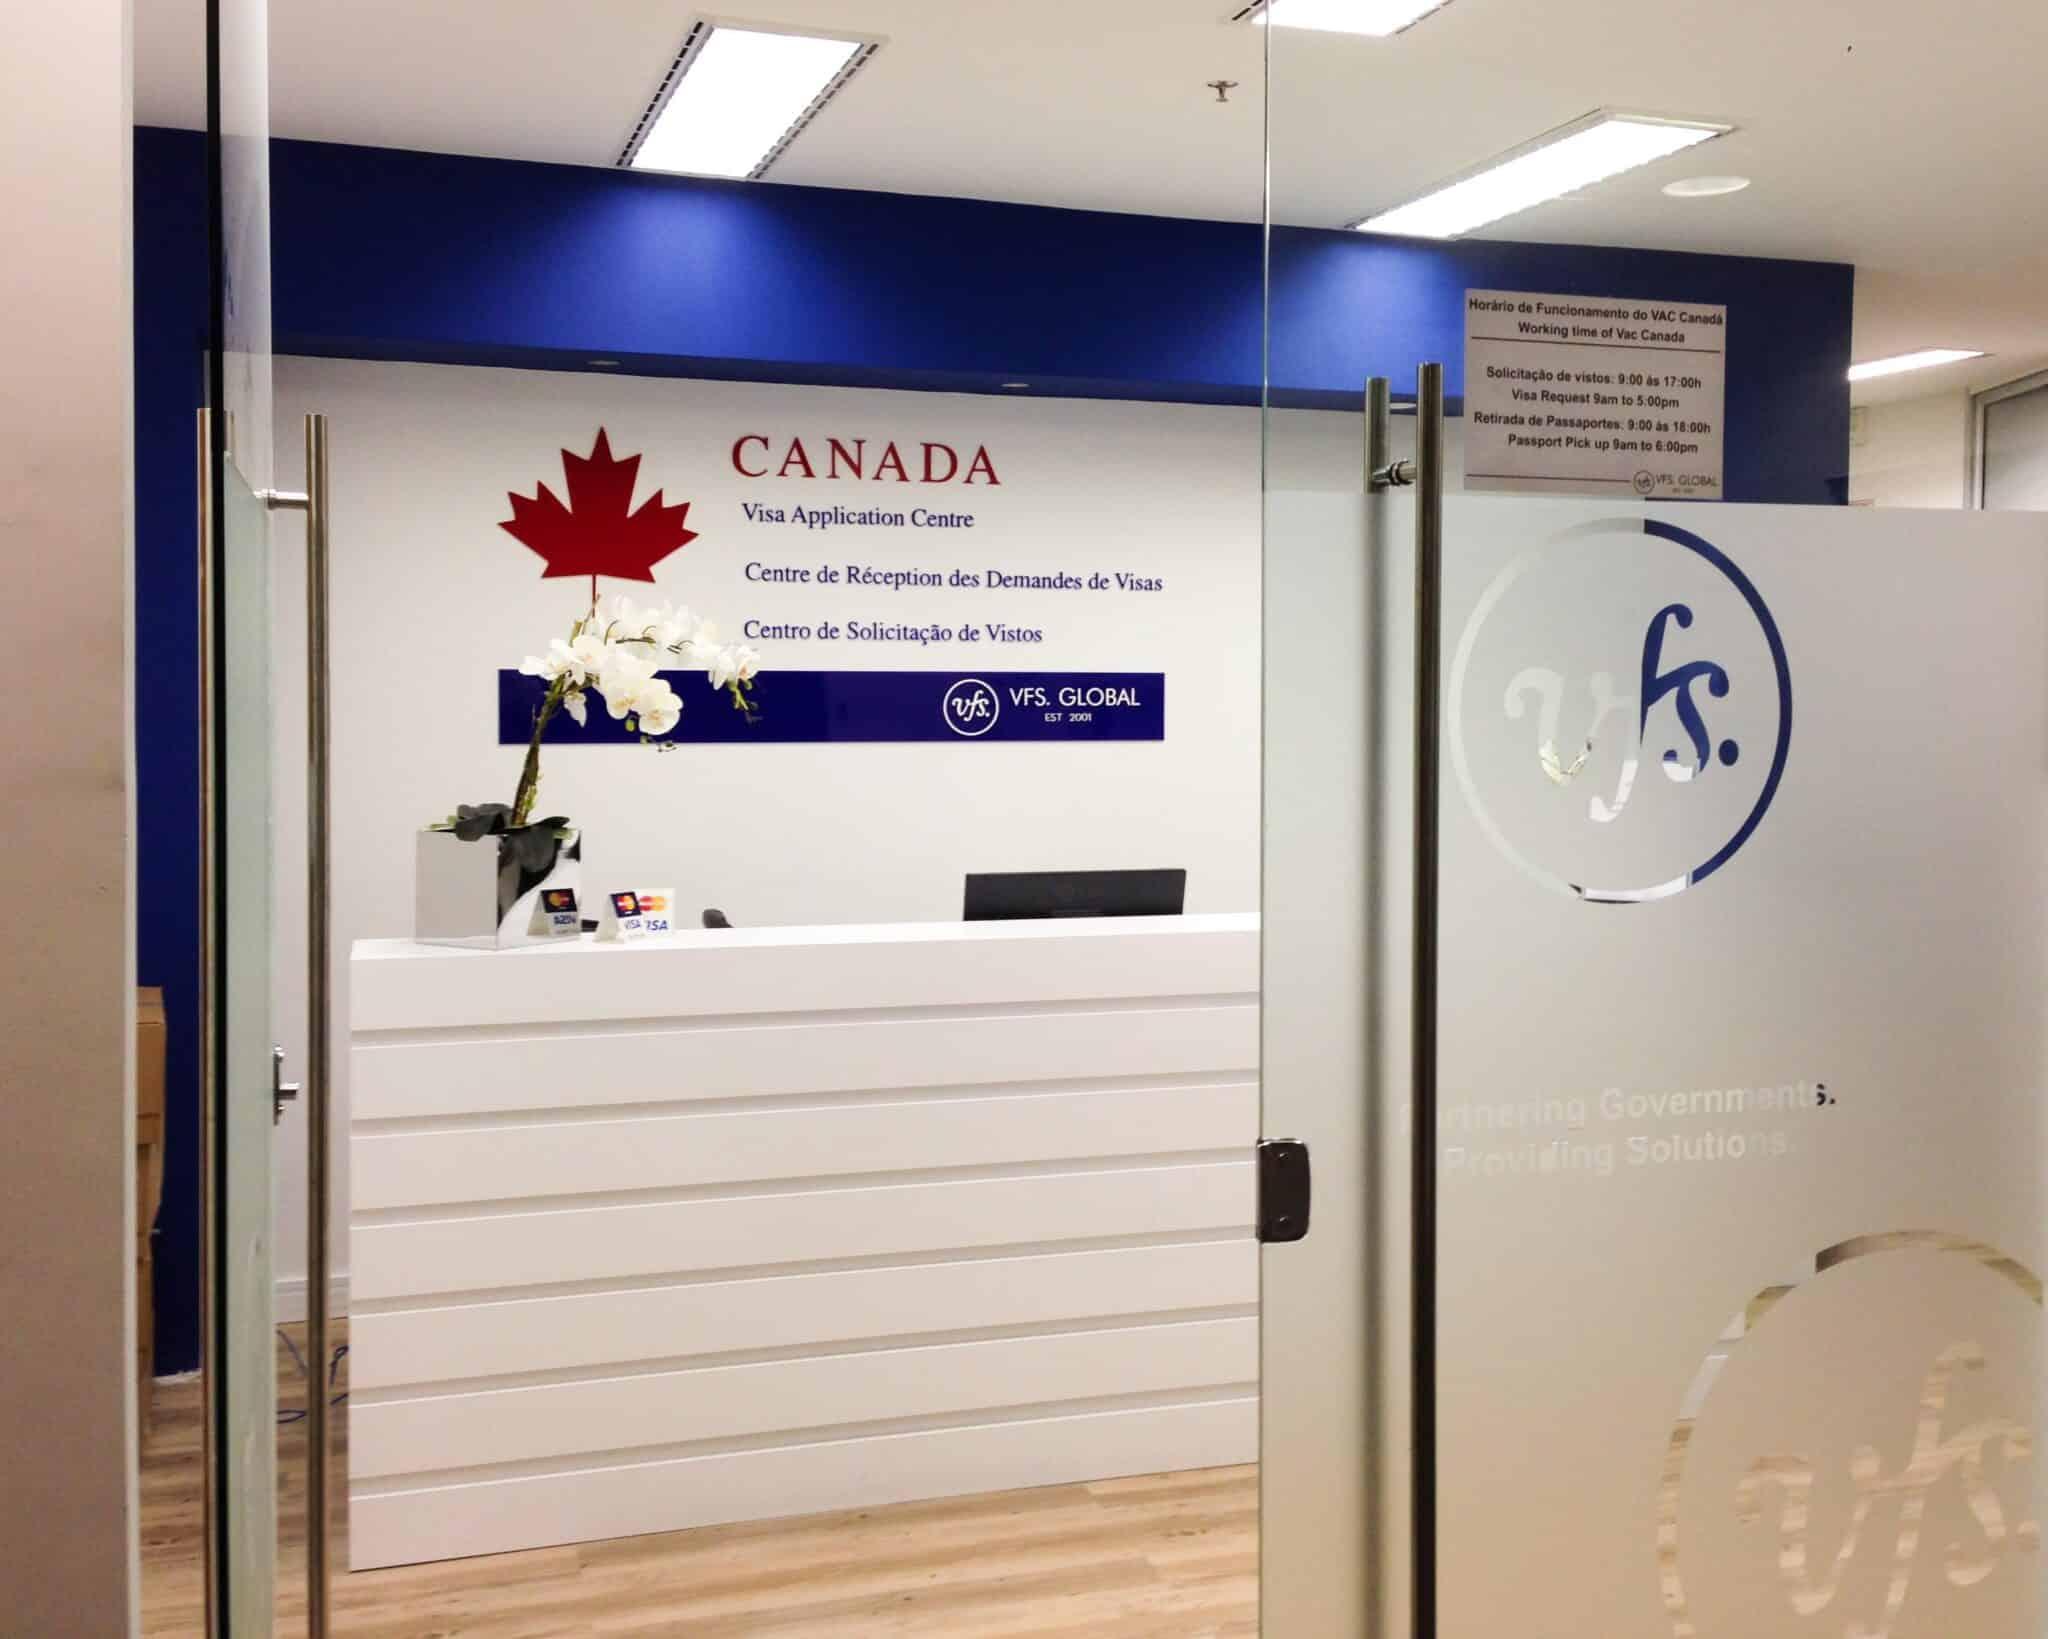 Visto-canadense-Canadá-VAC-São-Paulo-Foto-Nathalia-Molina-@ComoViaja-4